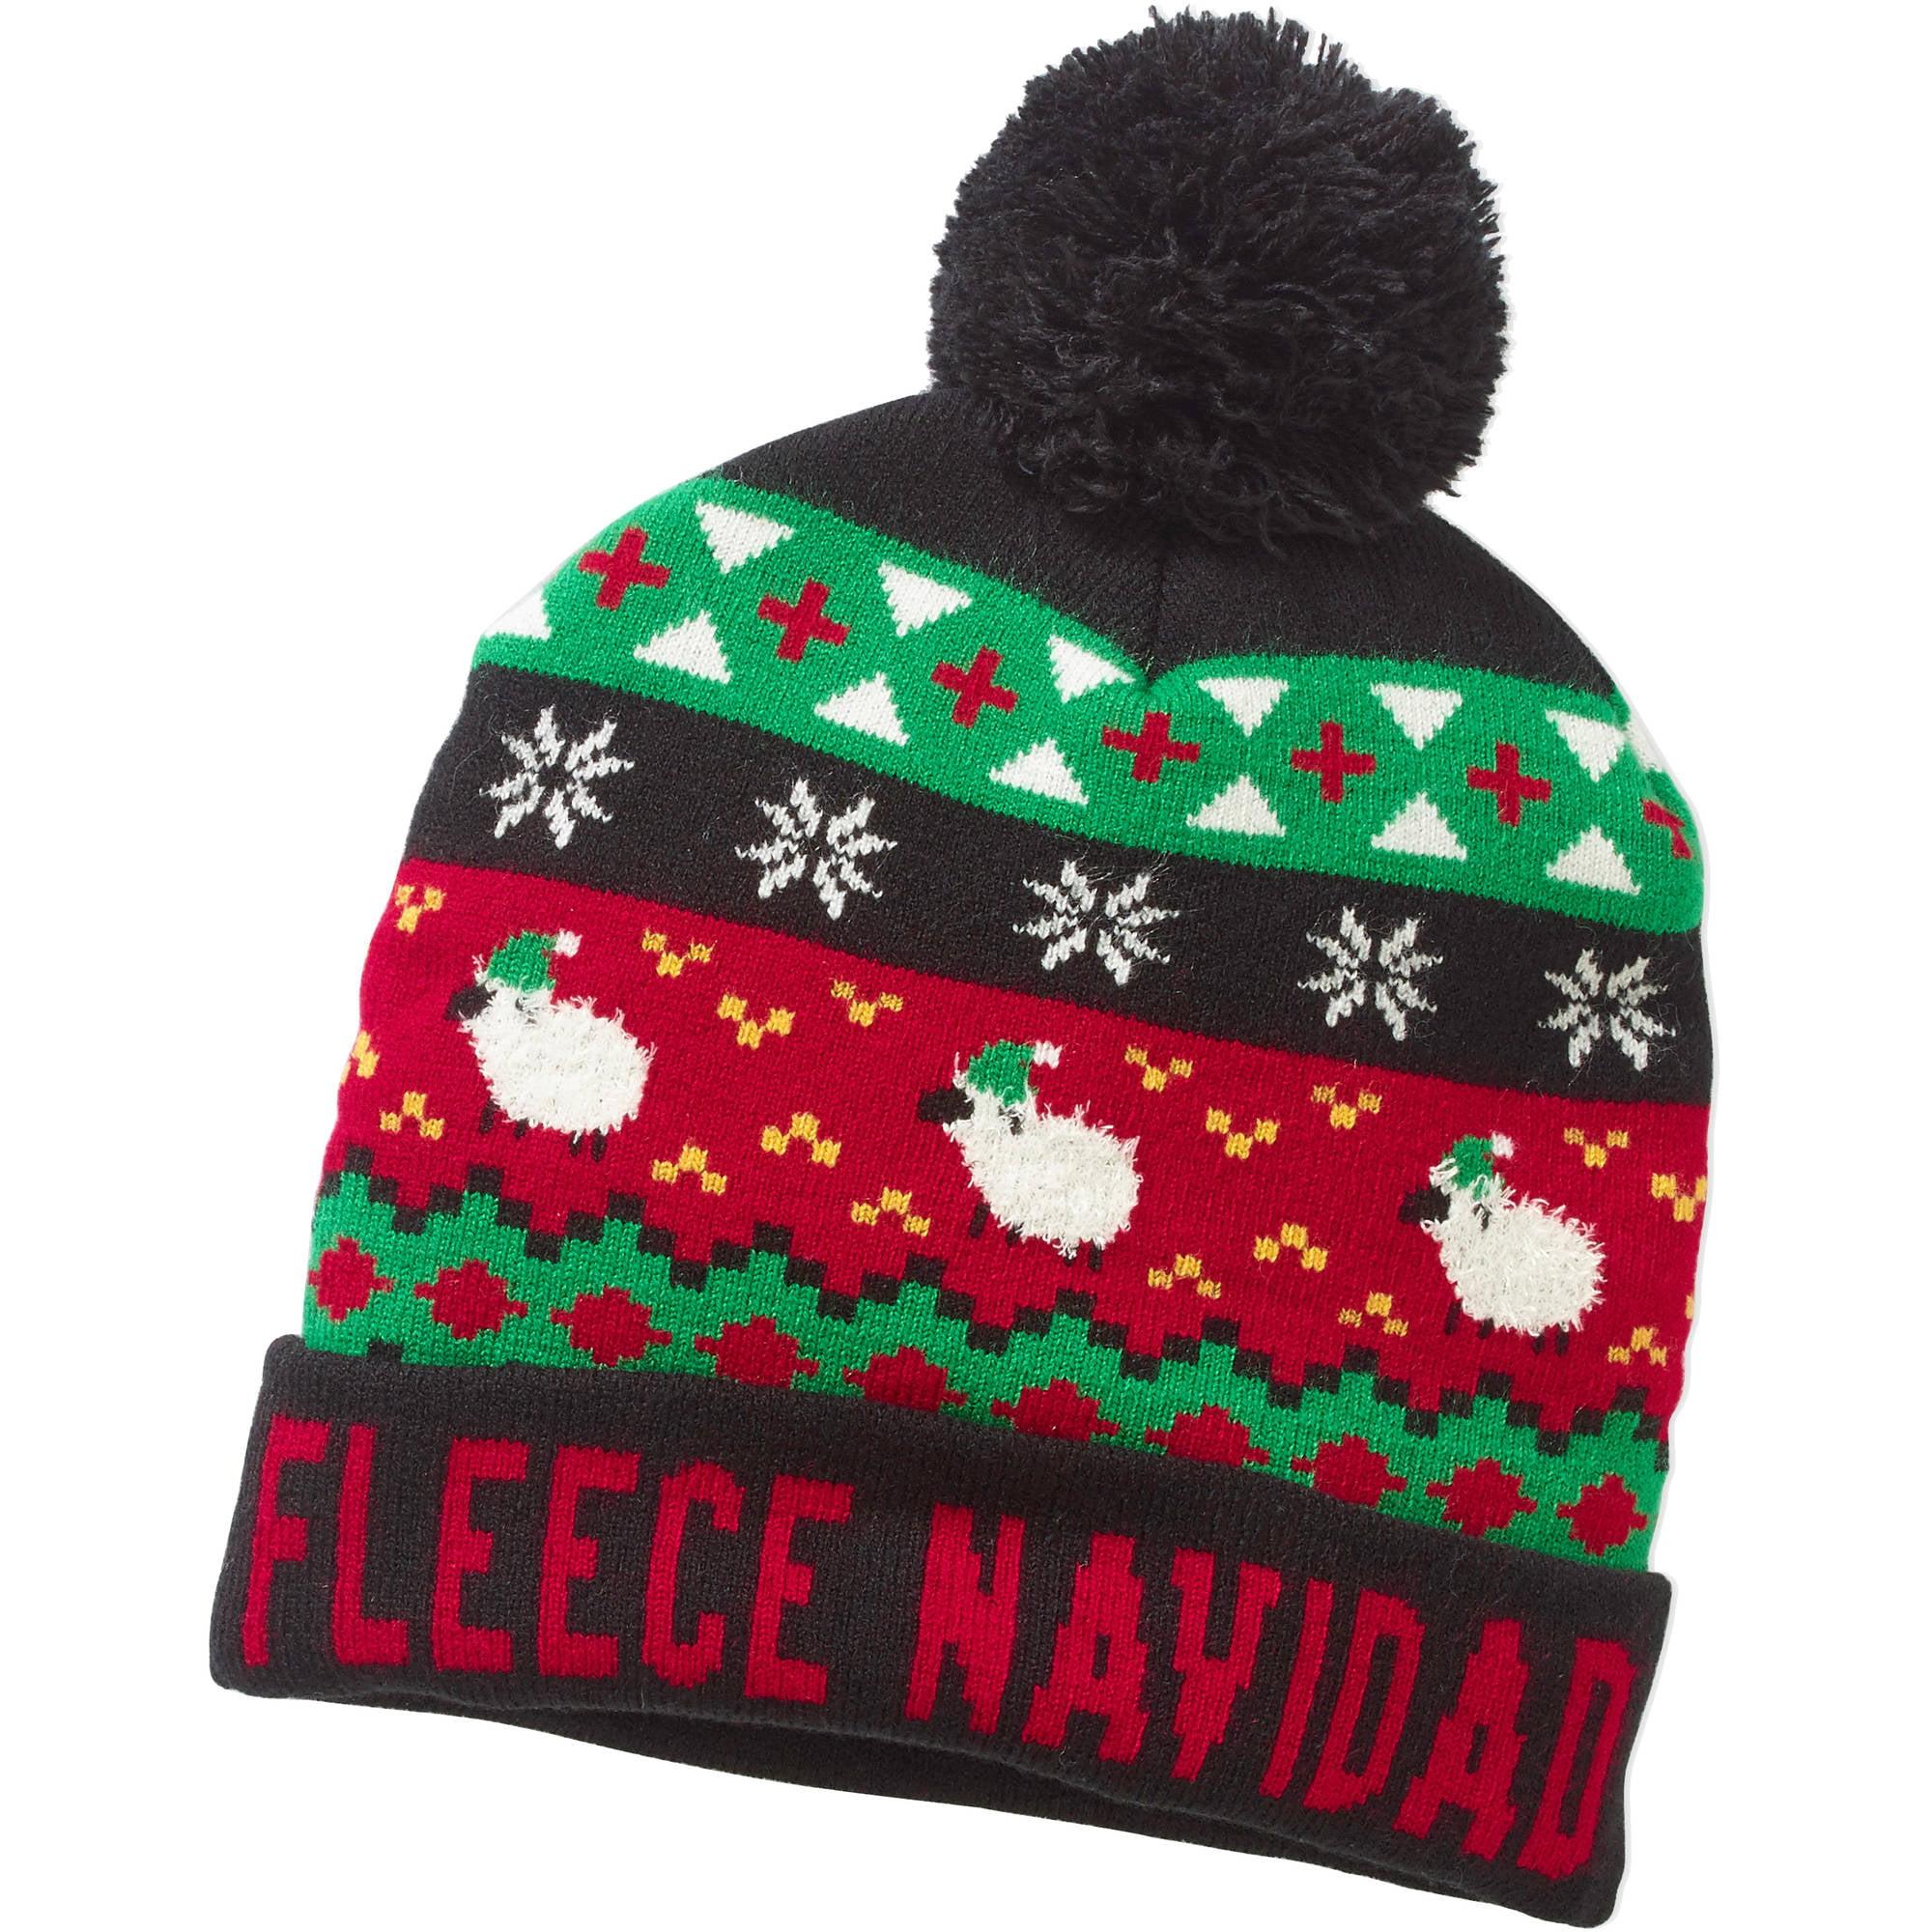 """Fleece Navidad"" Pom Beanie"